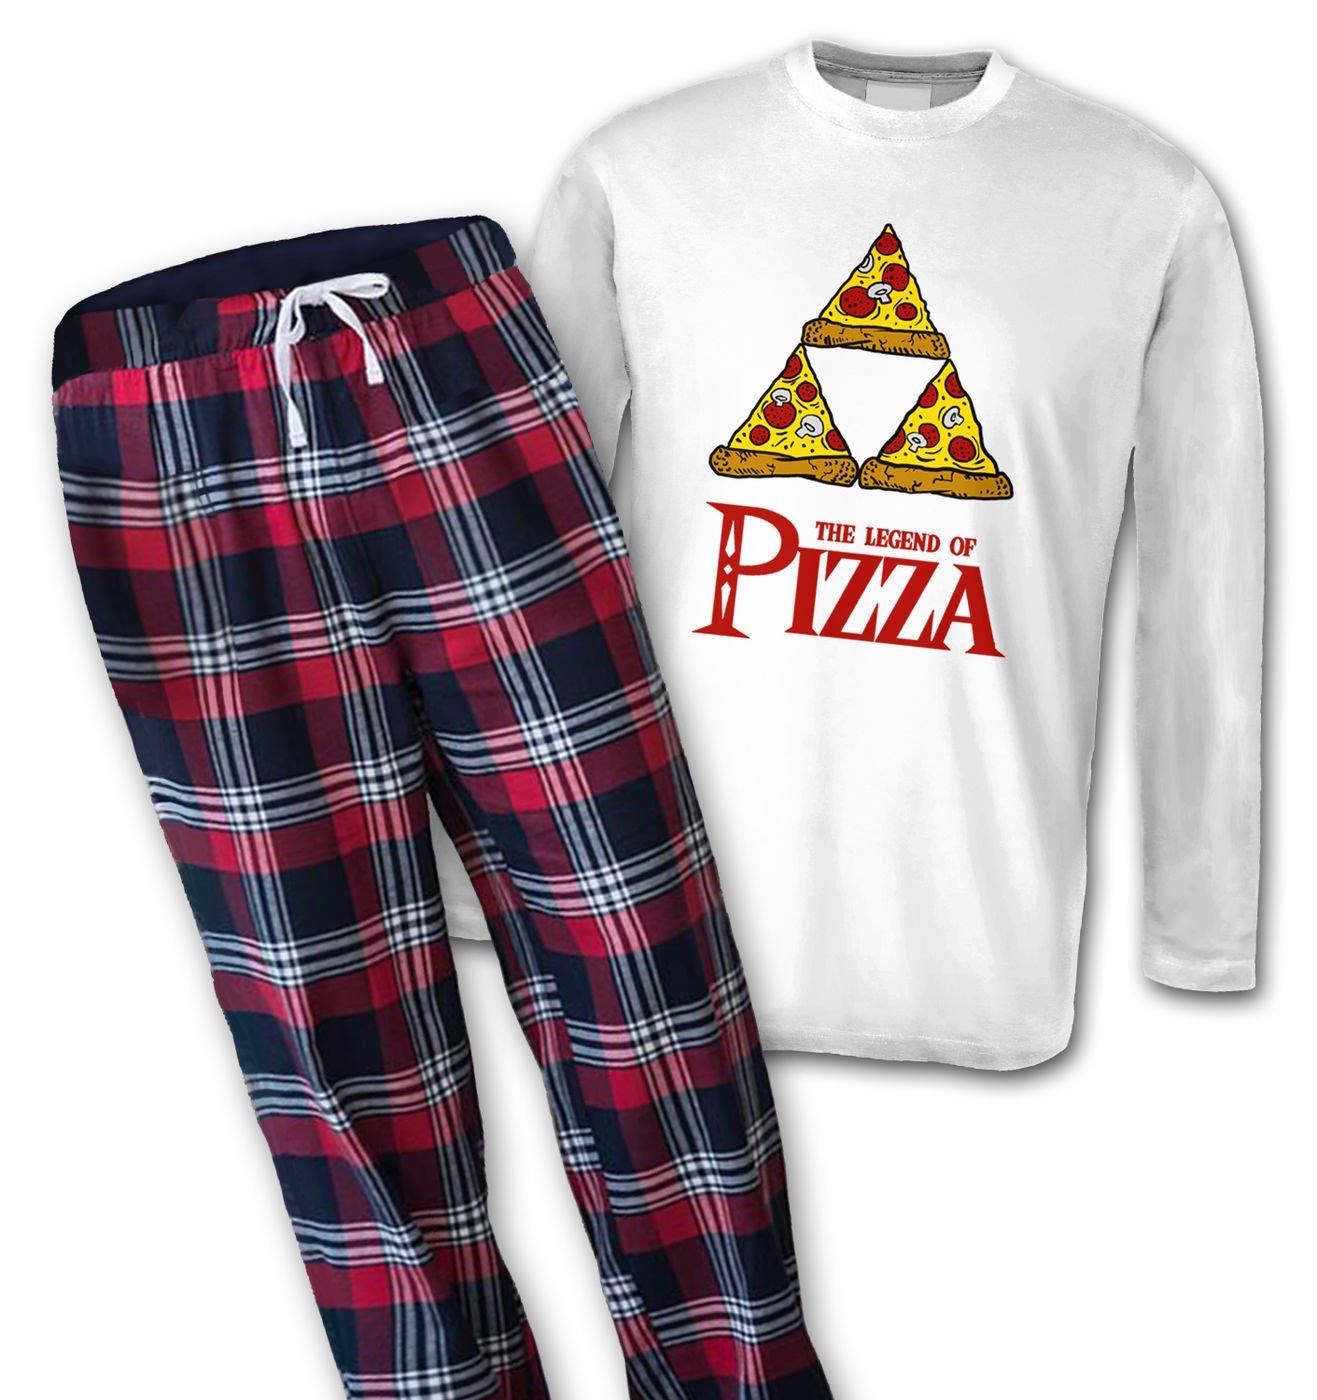 Legend Of Pizza mens long sleeve pyjamas by Something Geeky